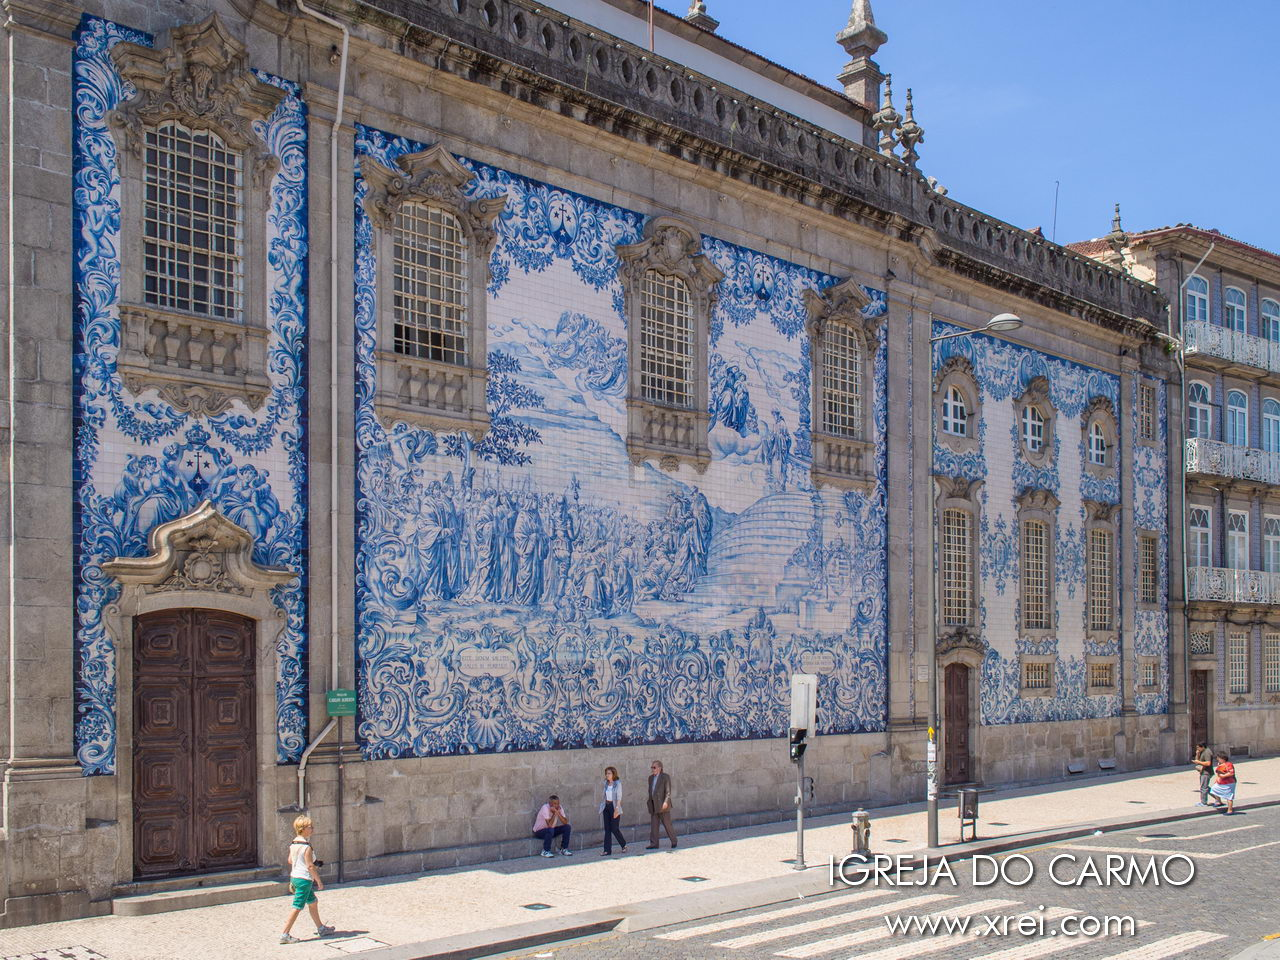 Fachada lateral de la Iglesia Carmo en Oporto, con temas de episodios del catolicismo representados en pintura de azulejos